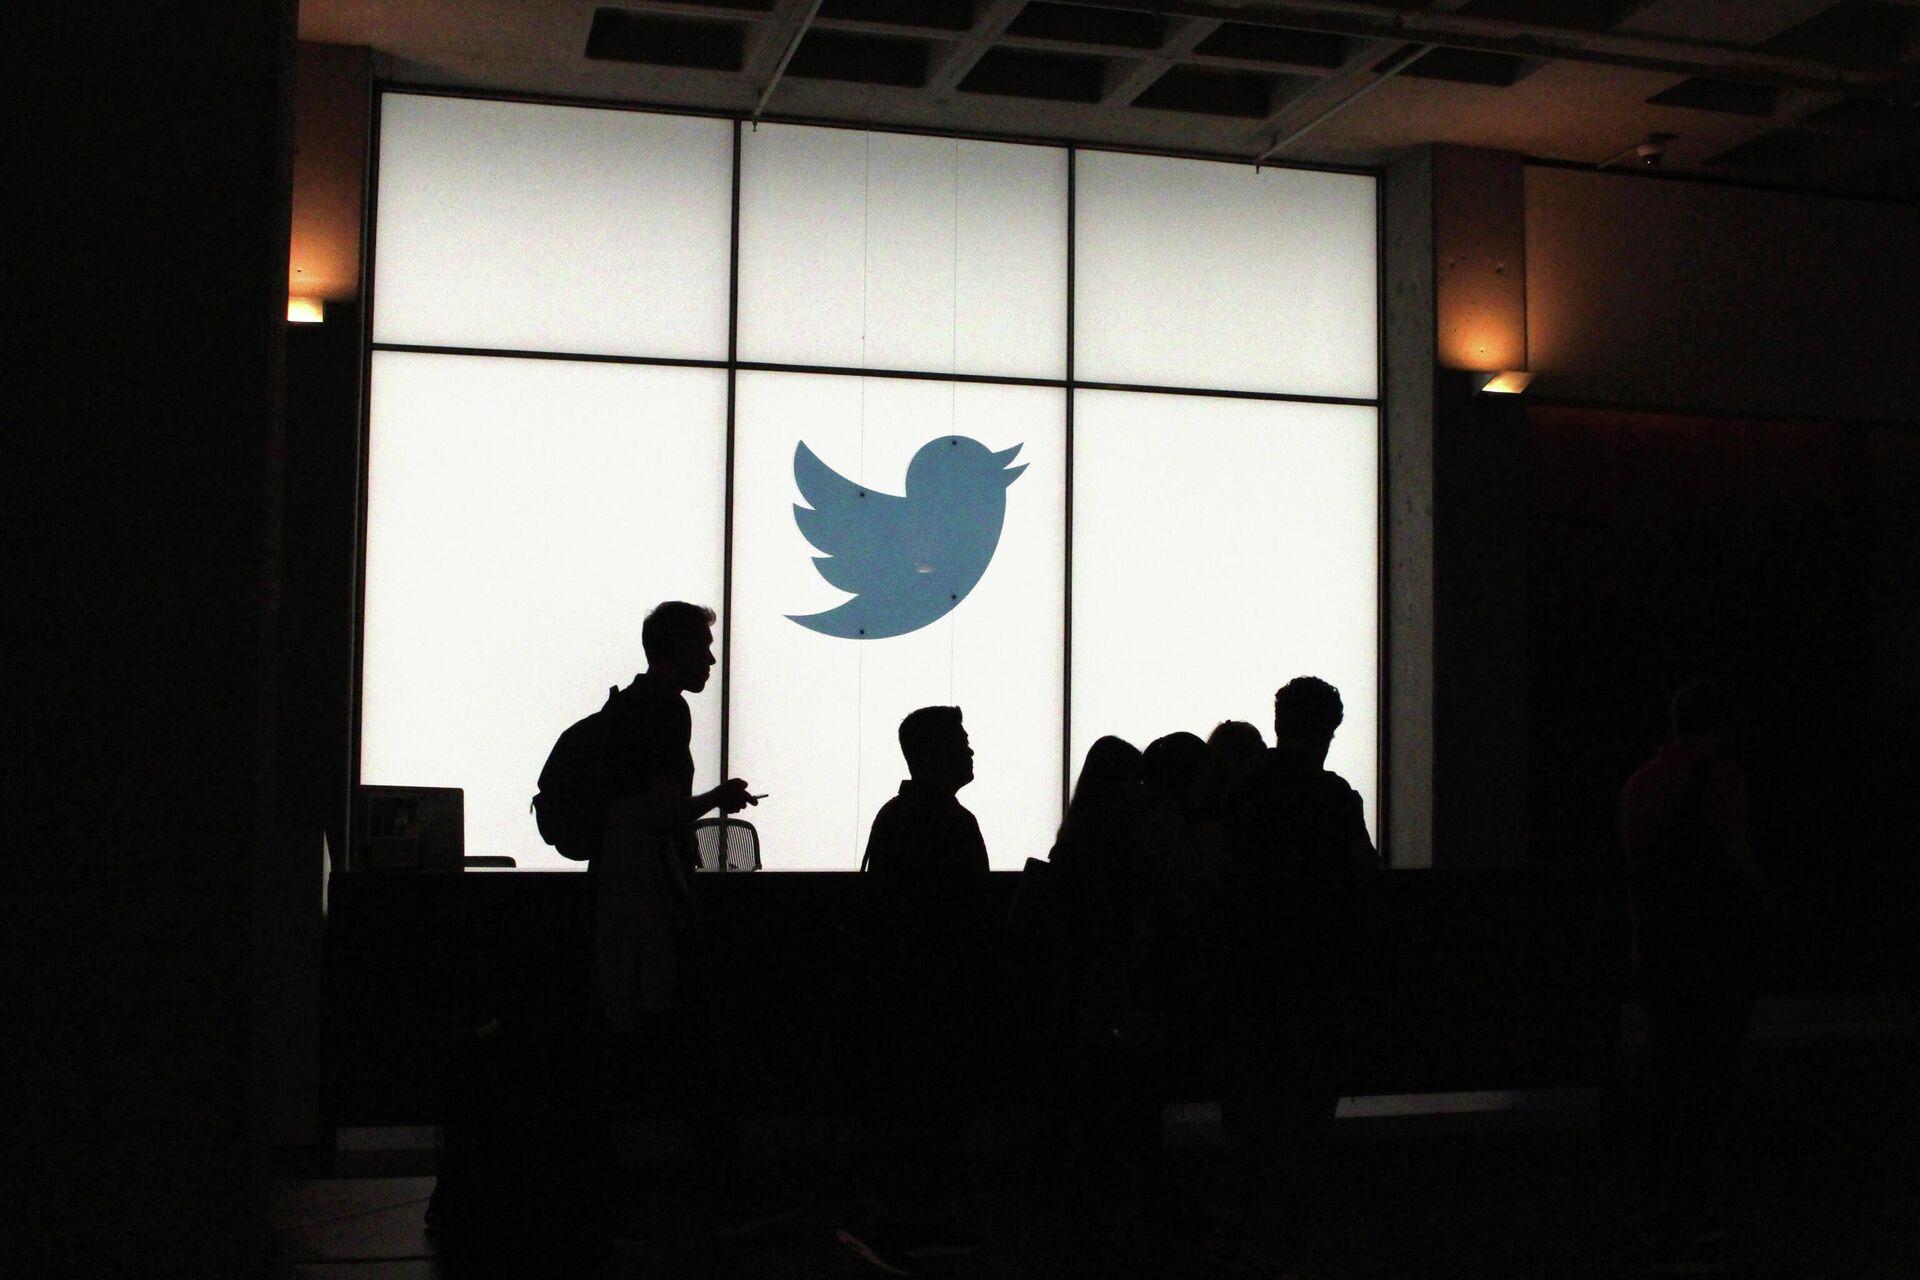 Офис Twitter в Сан-Франциско - РИА Новости, 1920, 21.01.2021